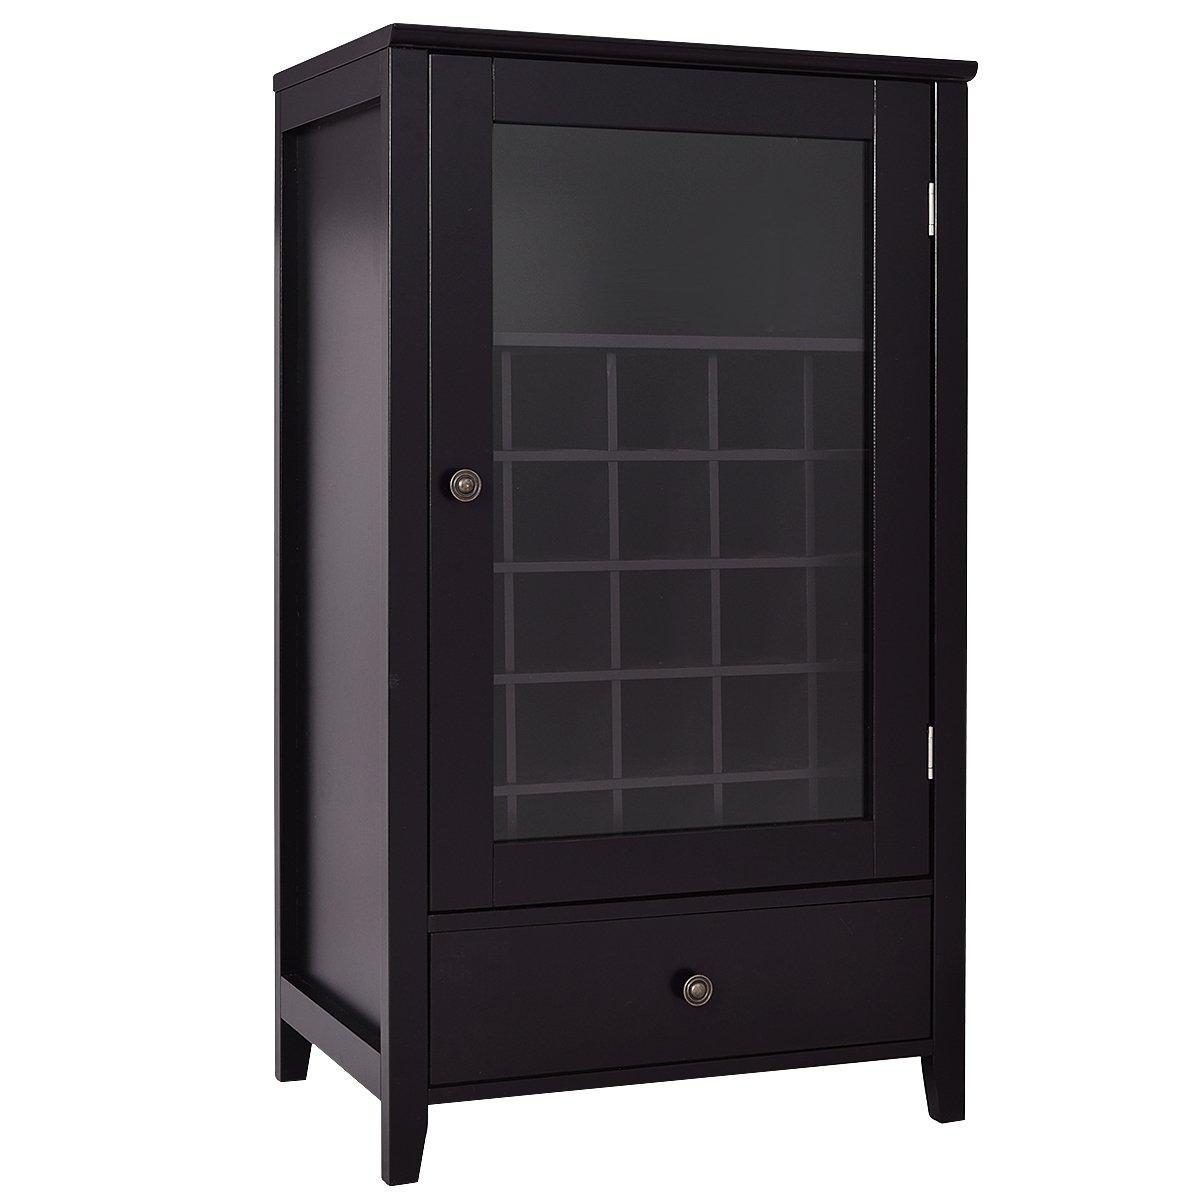 Giantex Wood Wine Cabinet Storage Home Shelf Wine Bottle Holder w/ Drawer Brown